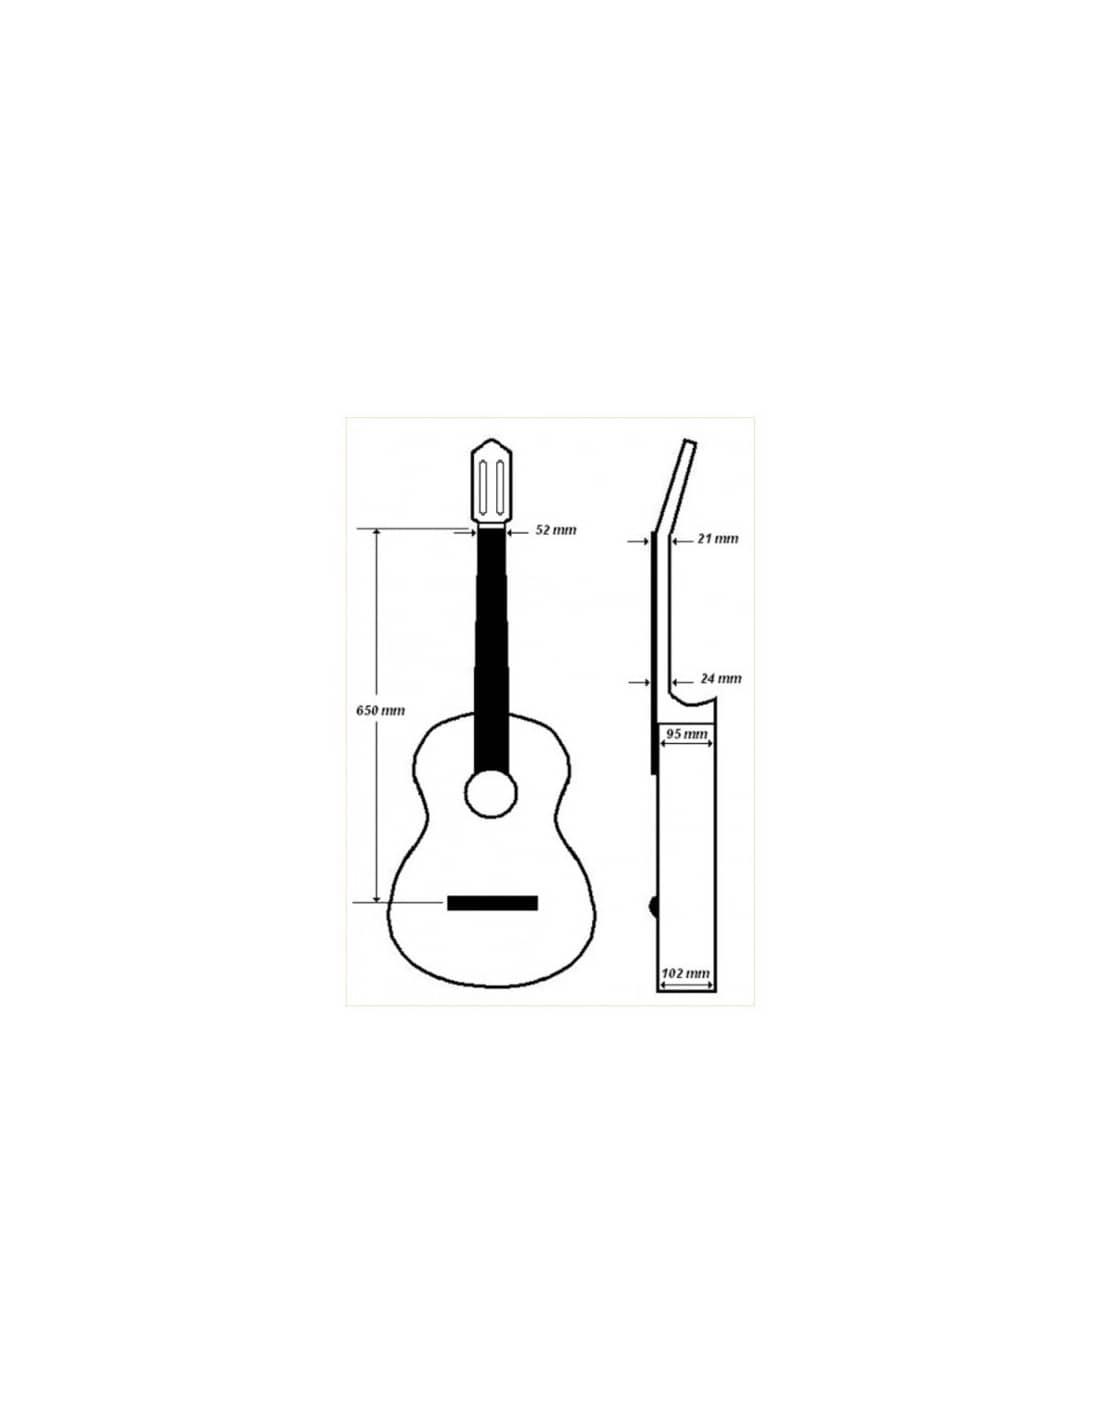 paco castillo 202 guitarra cl u00e1sica espa u00f1ola